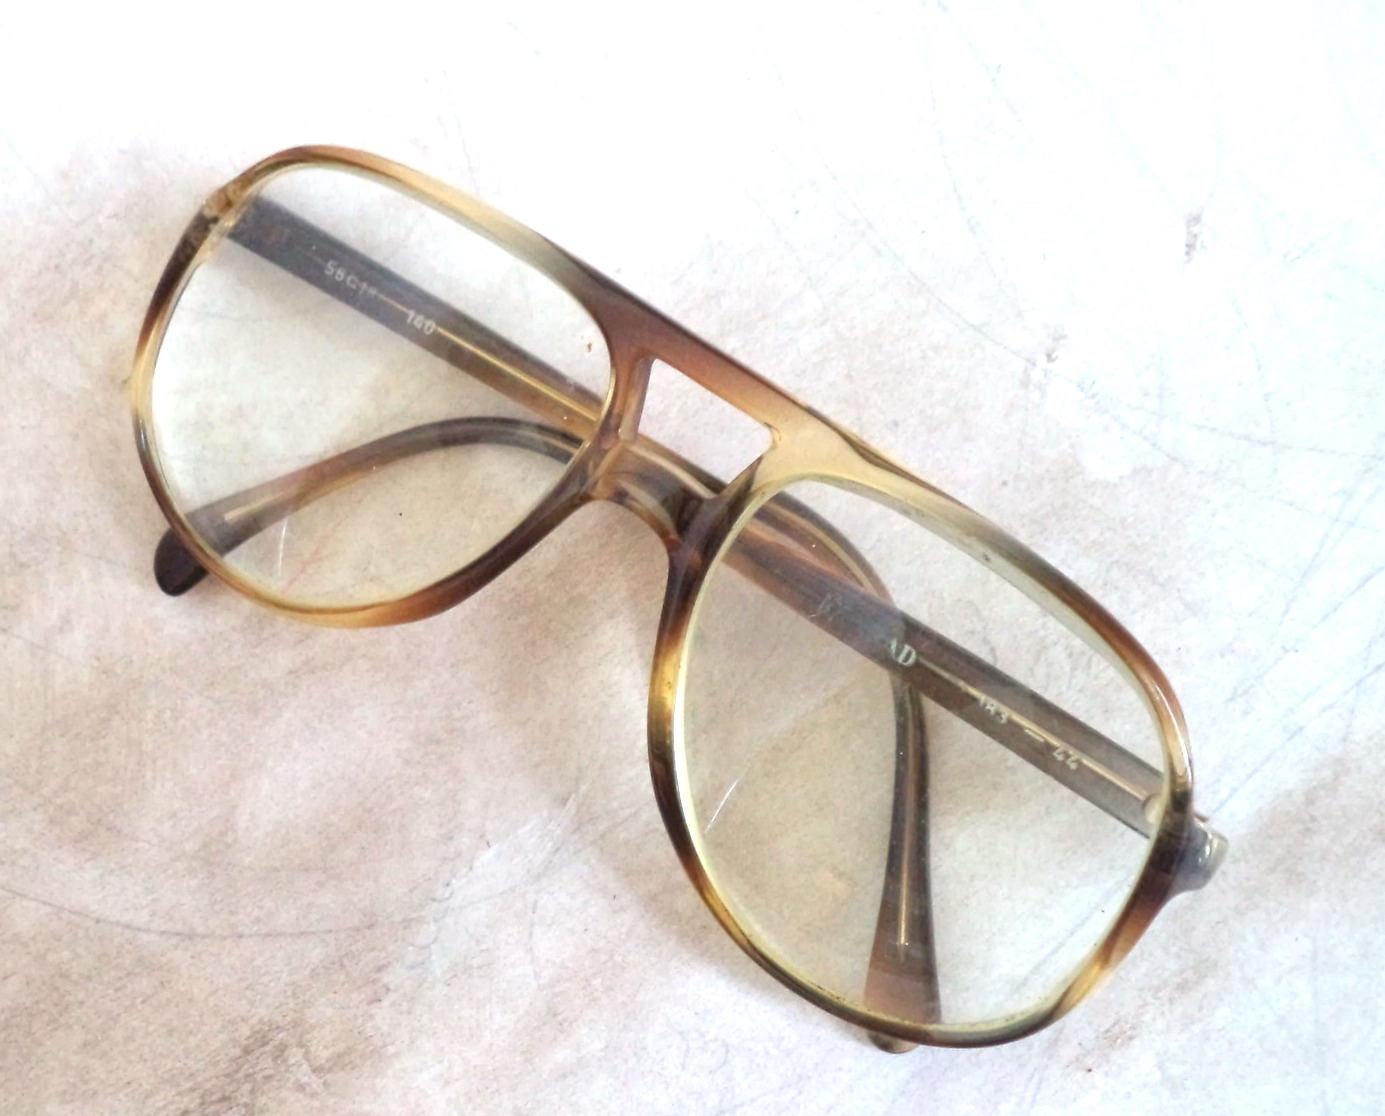 Menrad Retro Boho Aviator Brille Sonnenbrille Menrad Unisex   Etsy